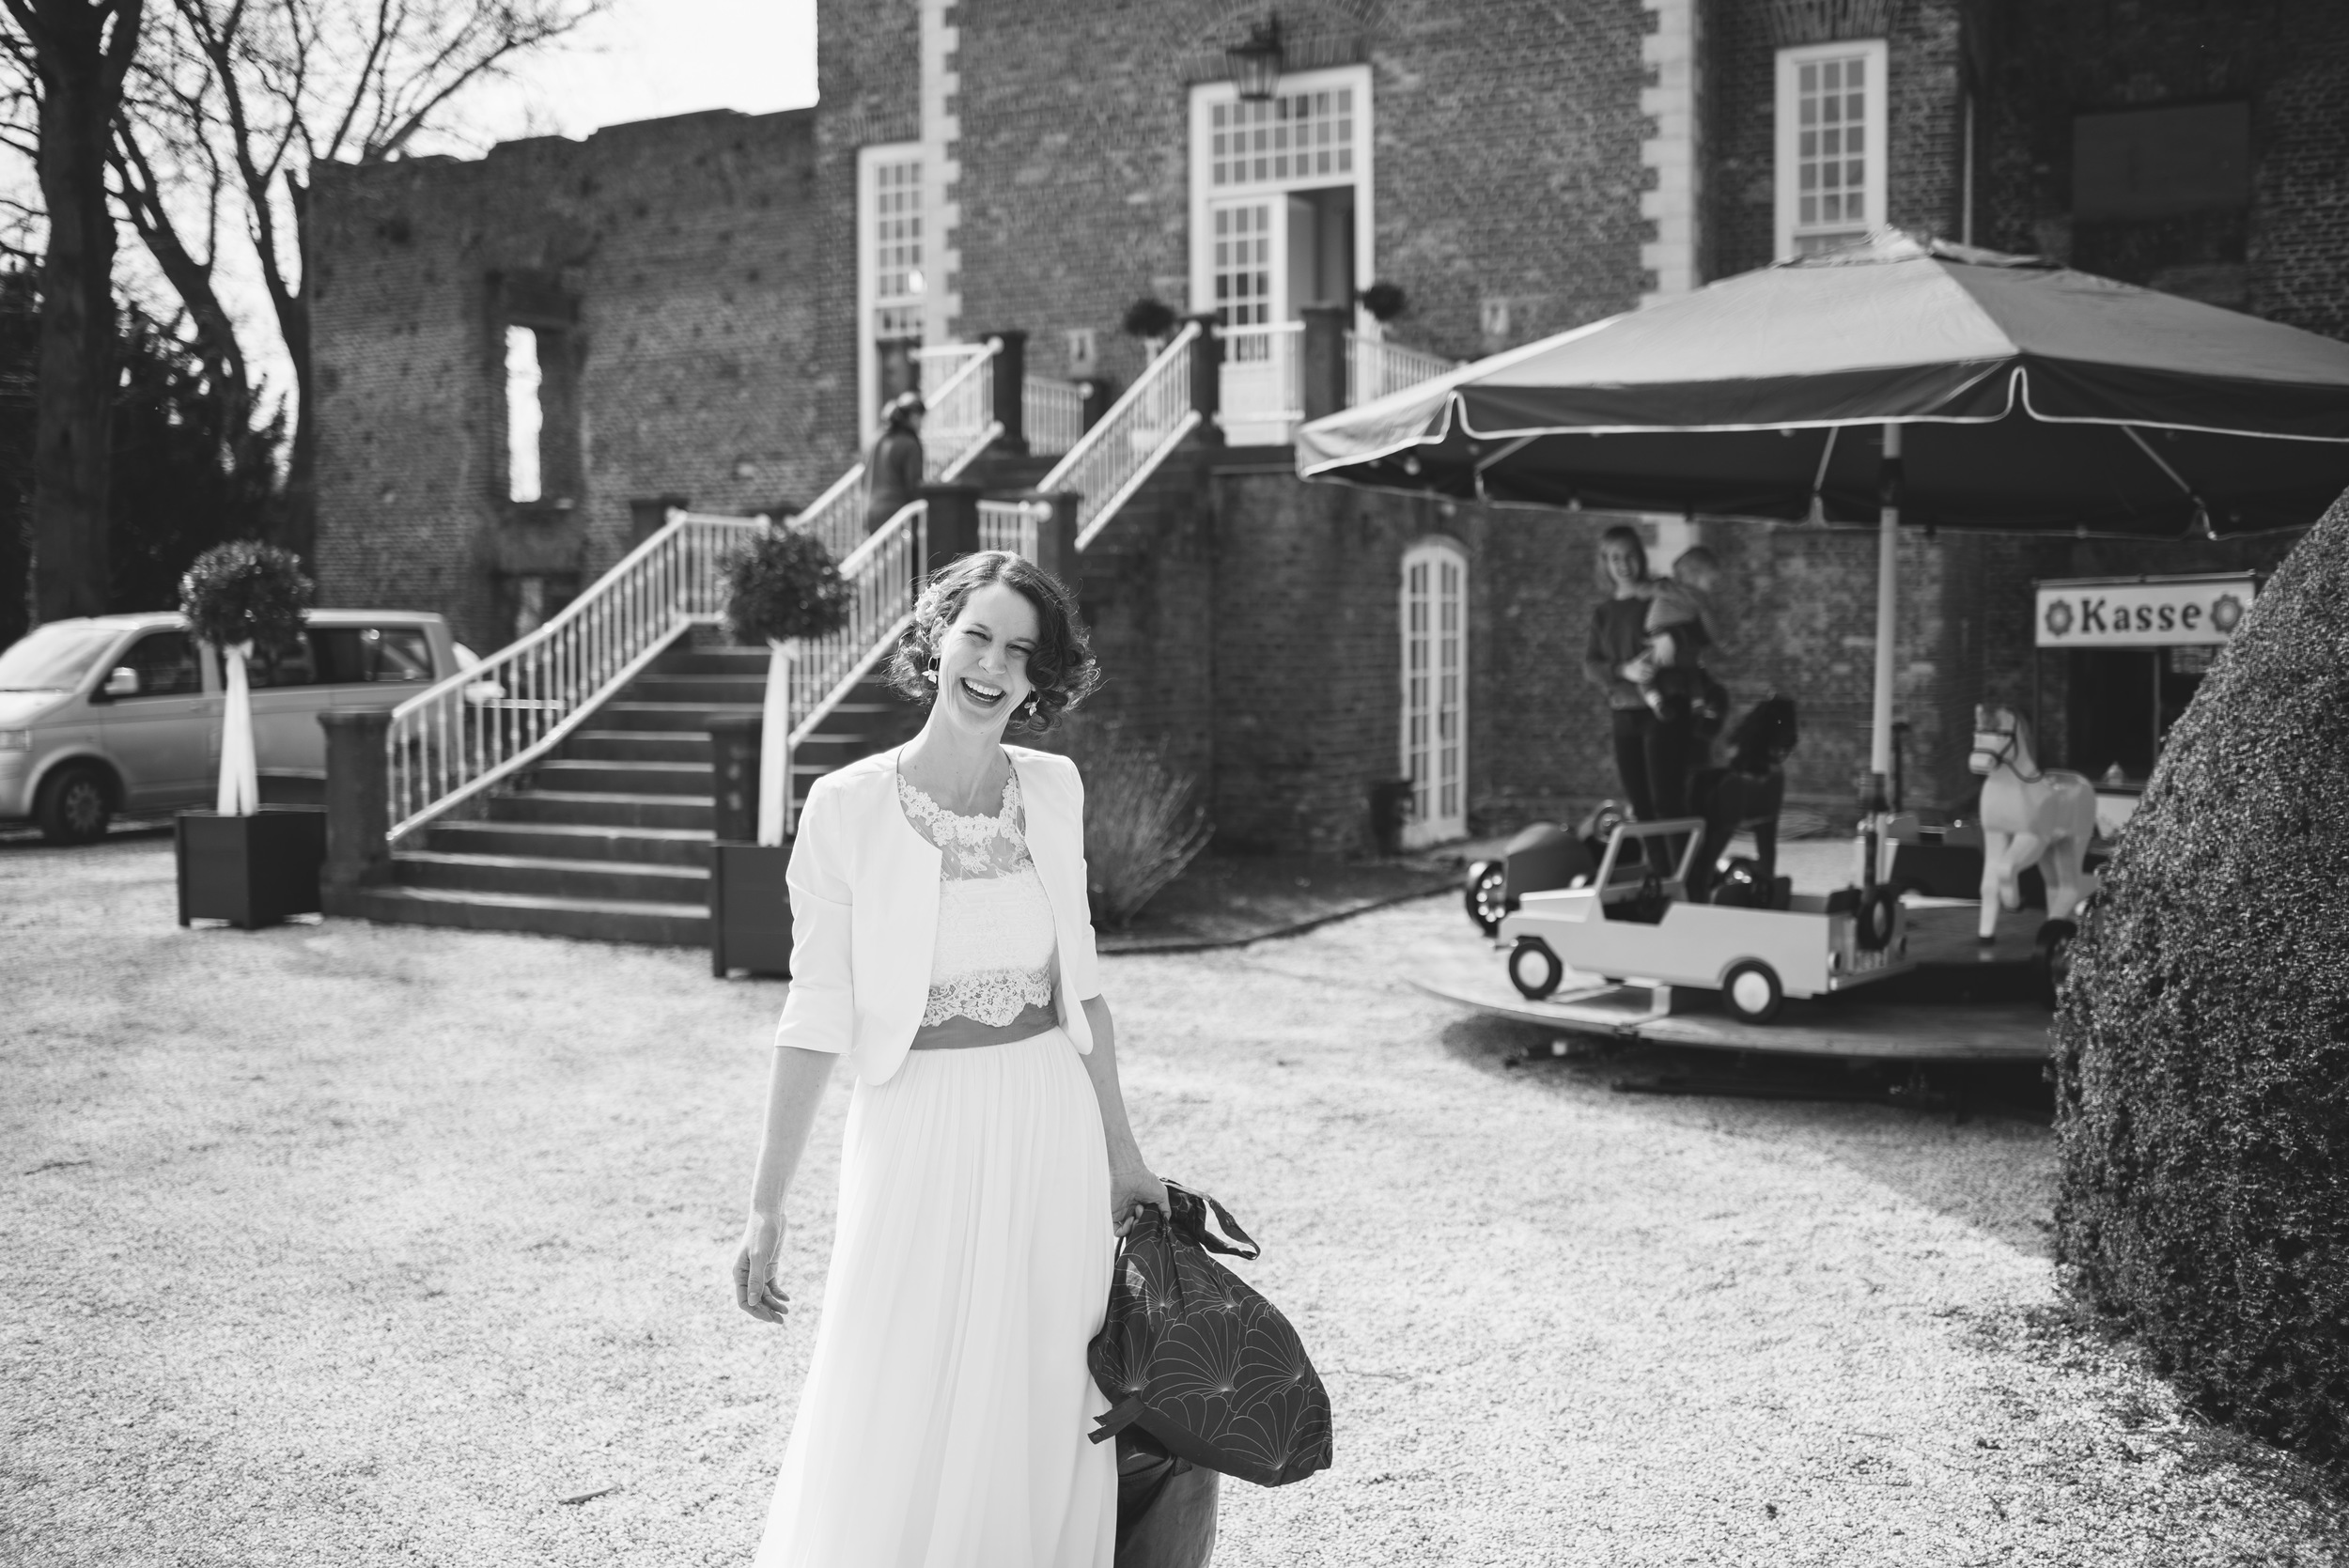 Hochzeitsfotograf-Schlossruine-Hertefeld-Weeze-004.jpg